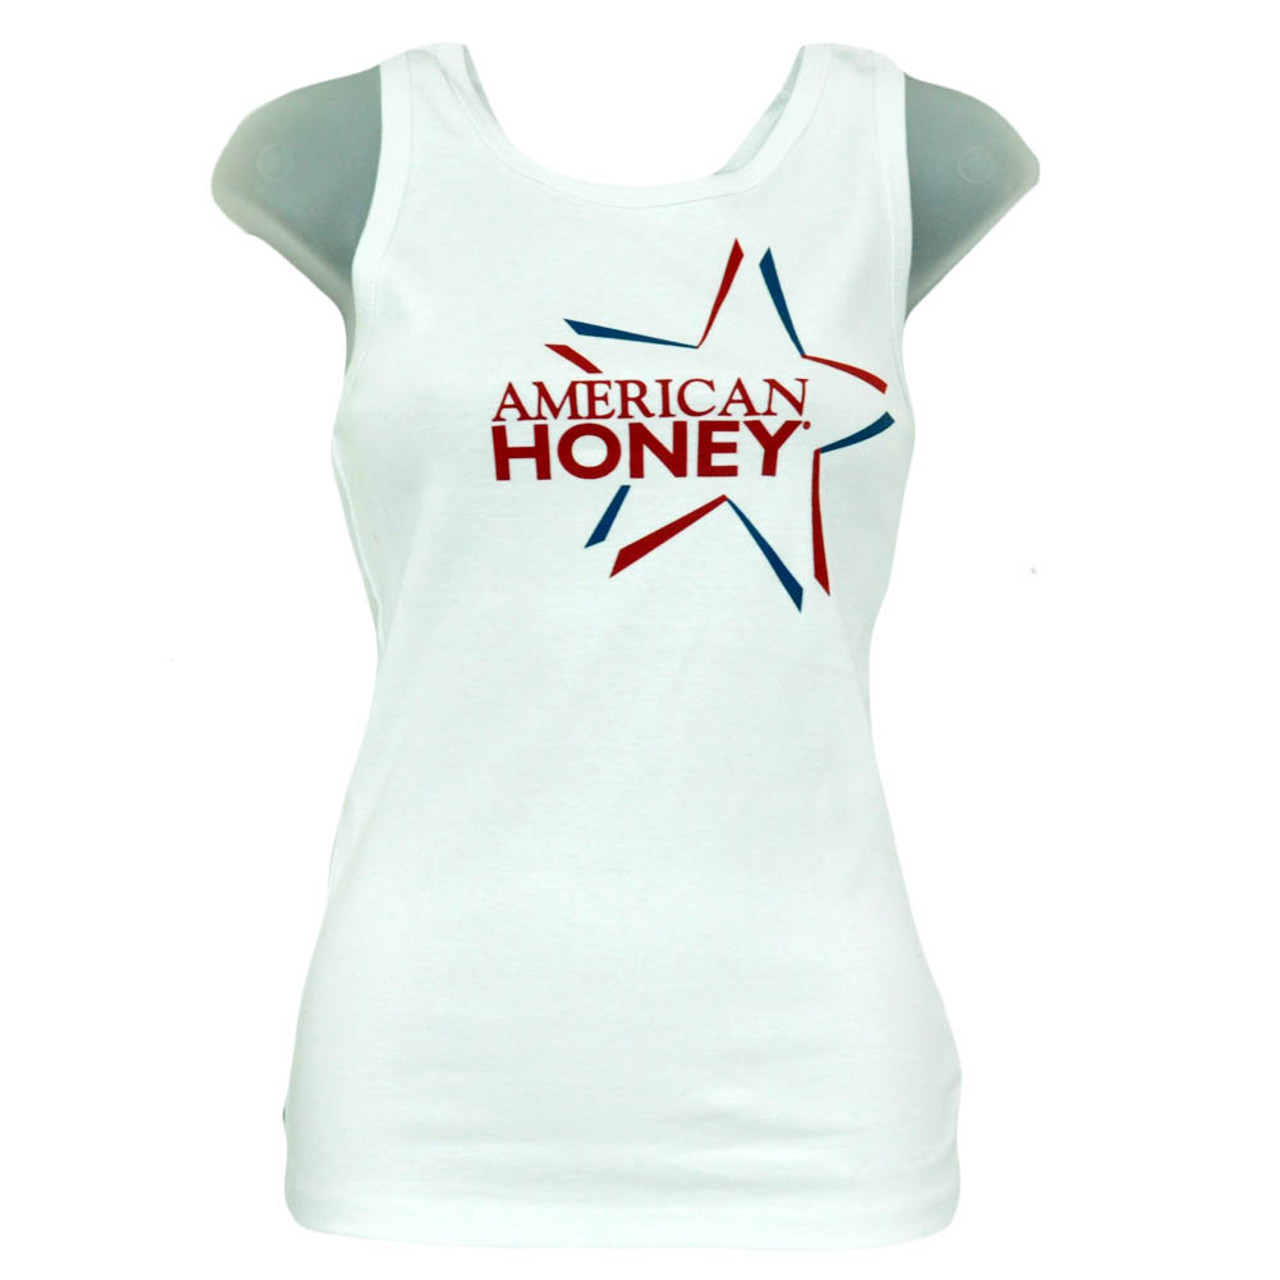 American Honey July 4th Red White Blue Star Juniors Girls Tank Top Shirt